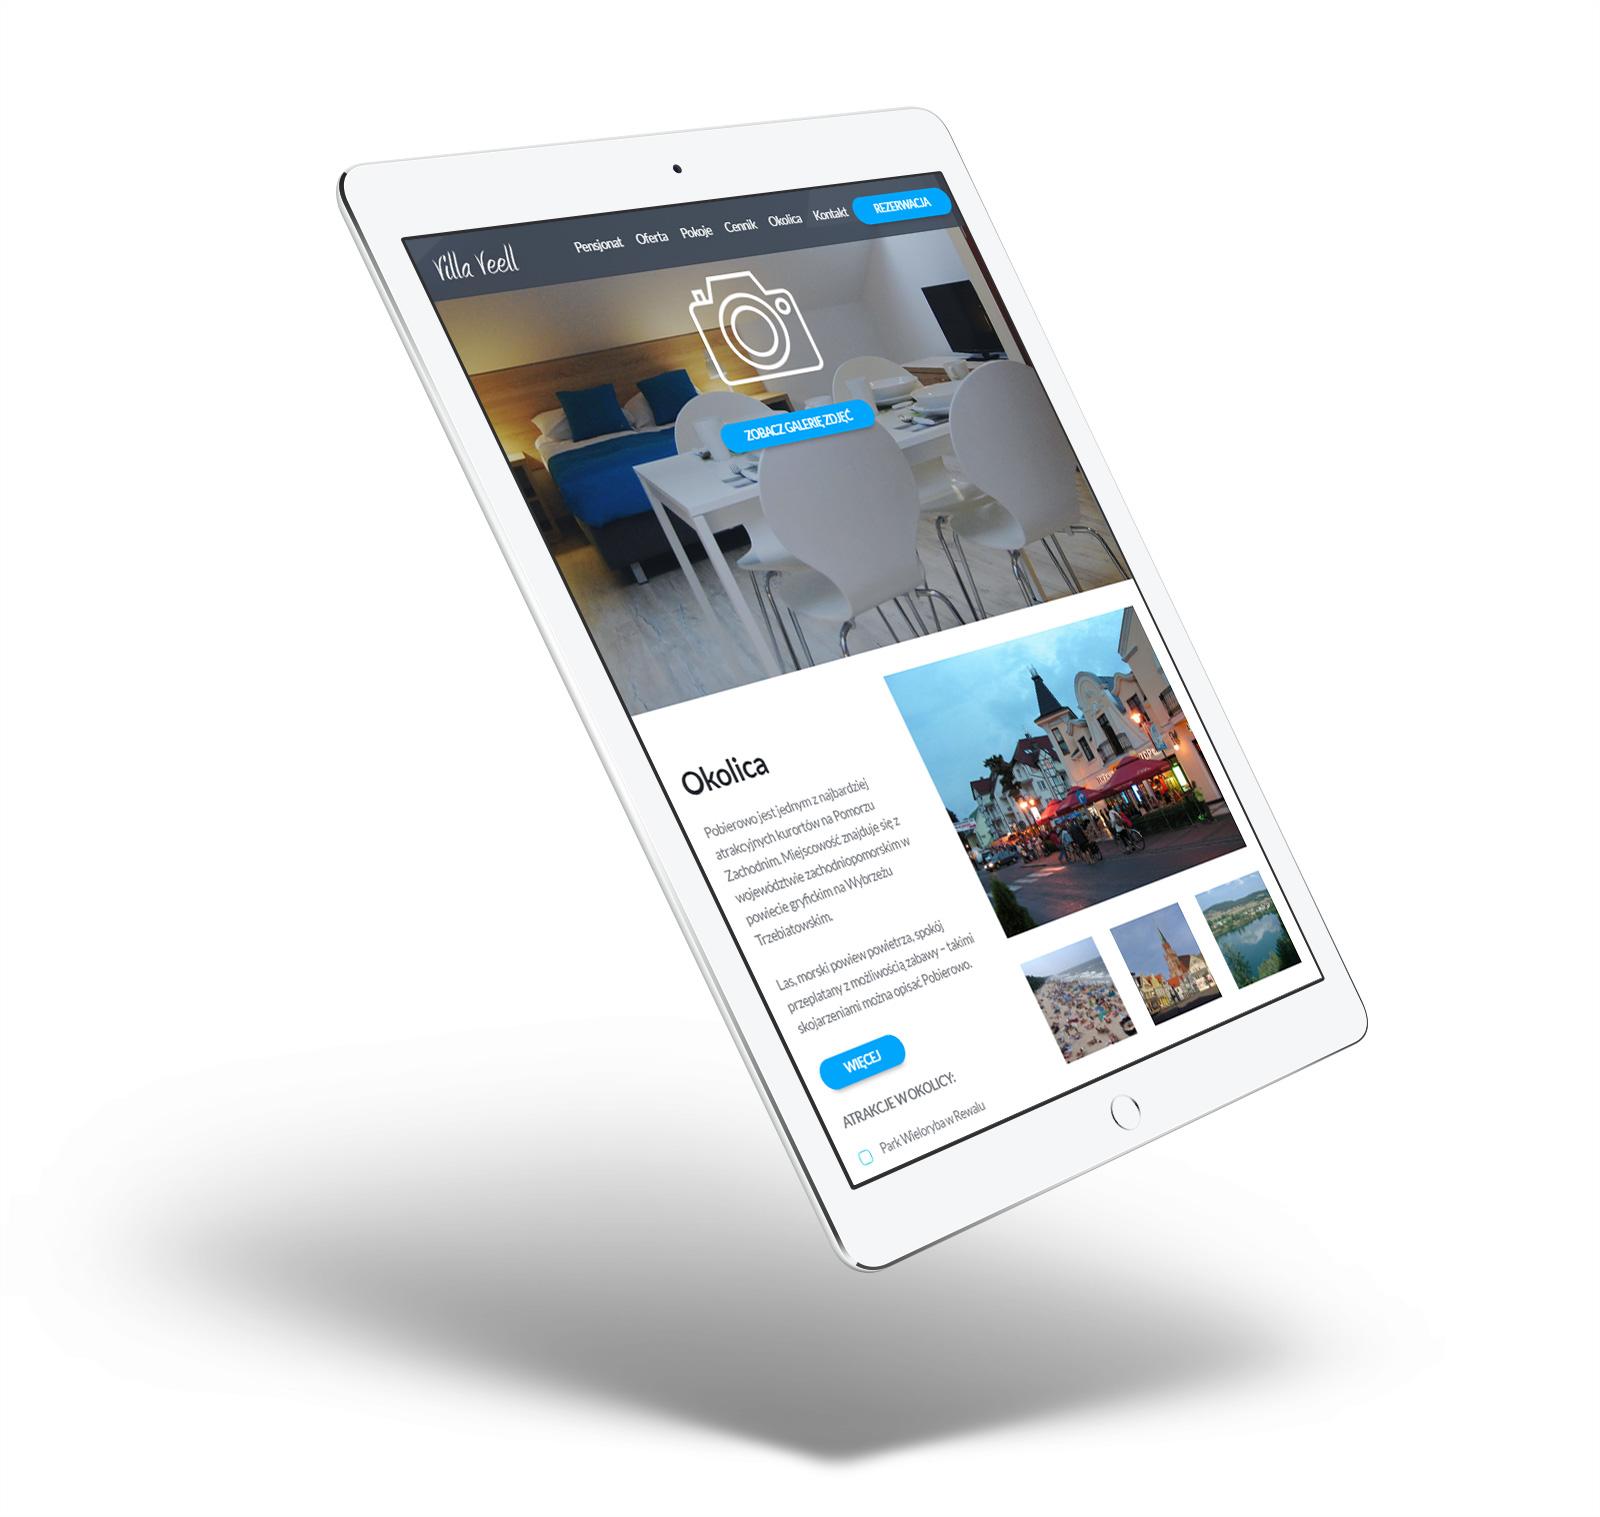 villa veell - strona internetowa na tablecie